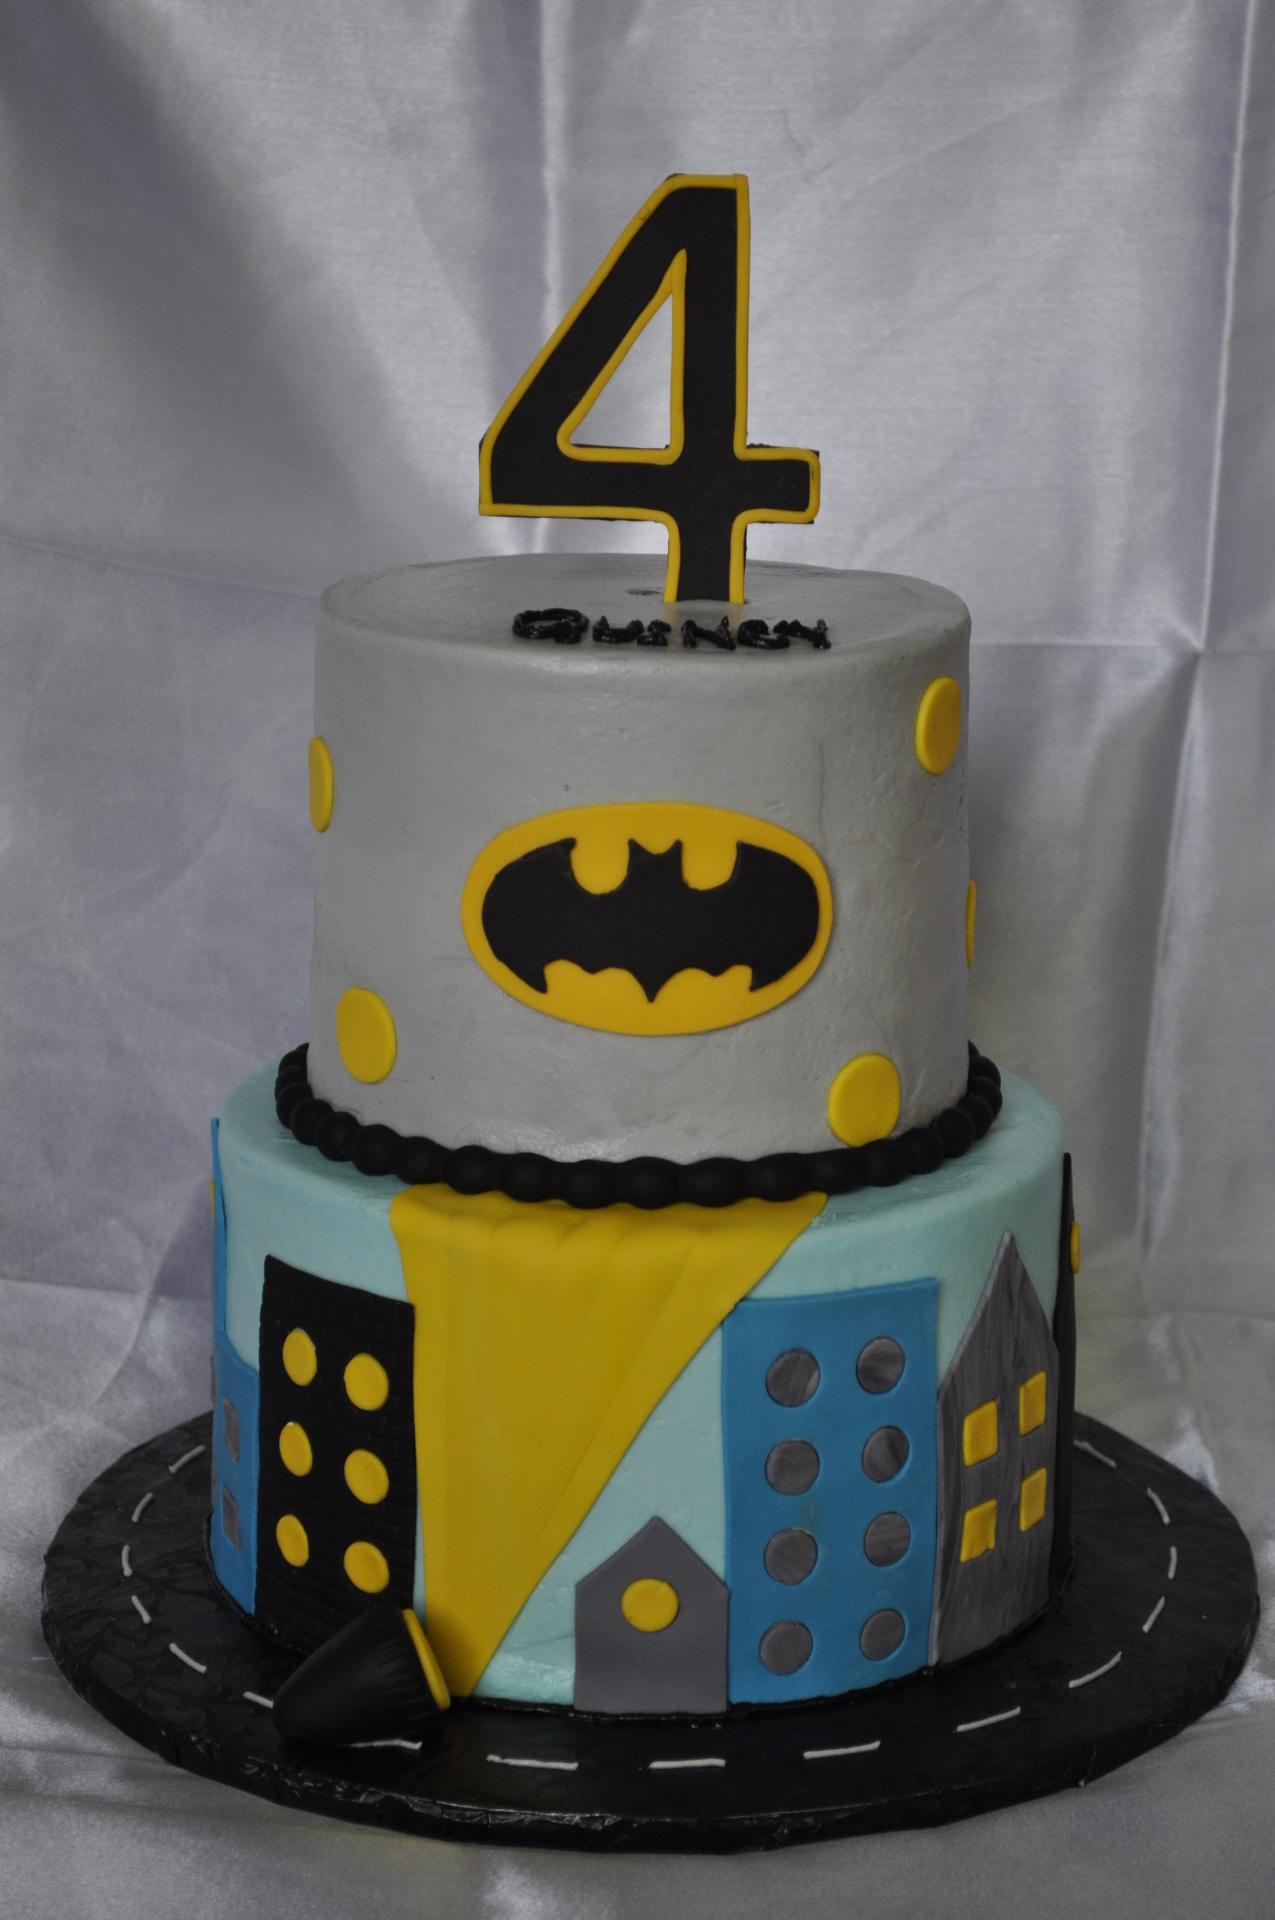 Batman theme tiered birthday